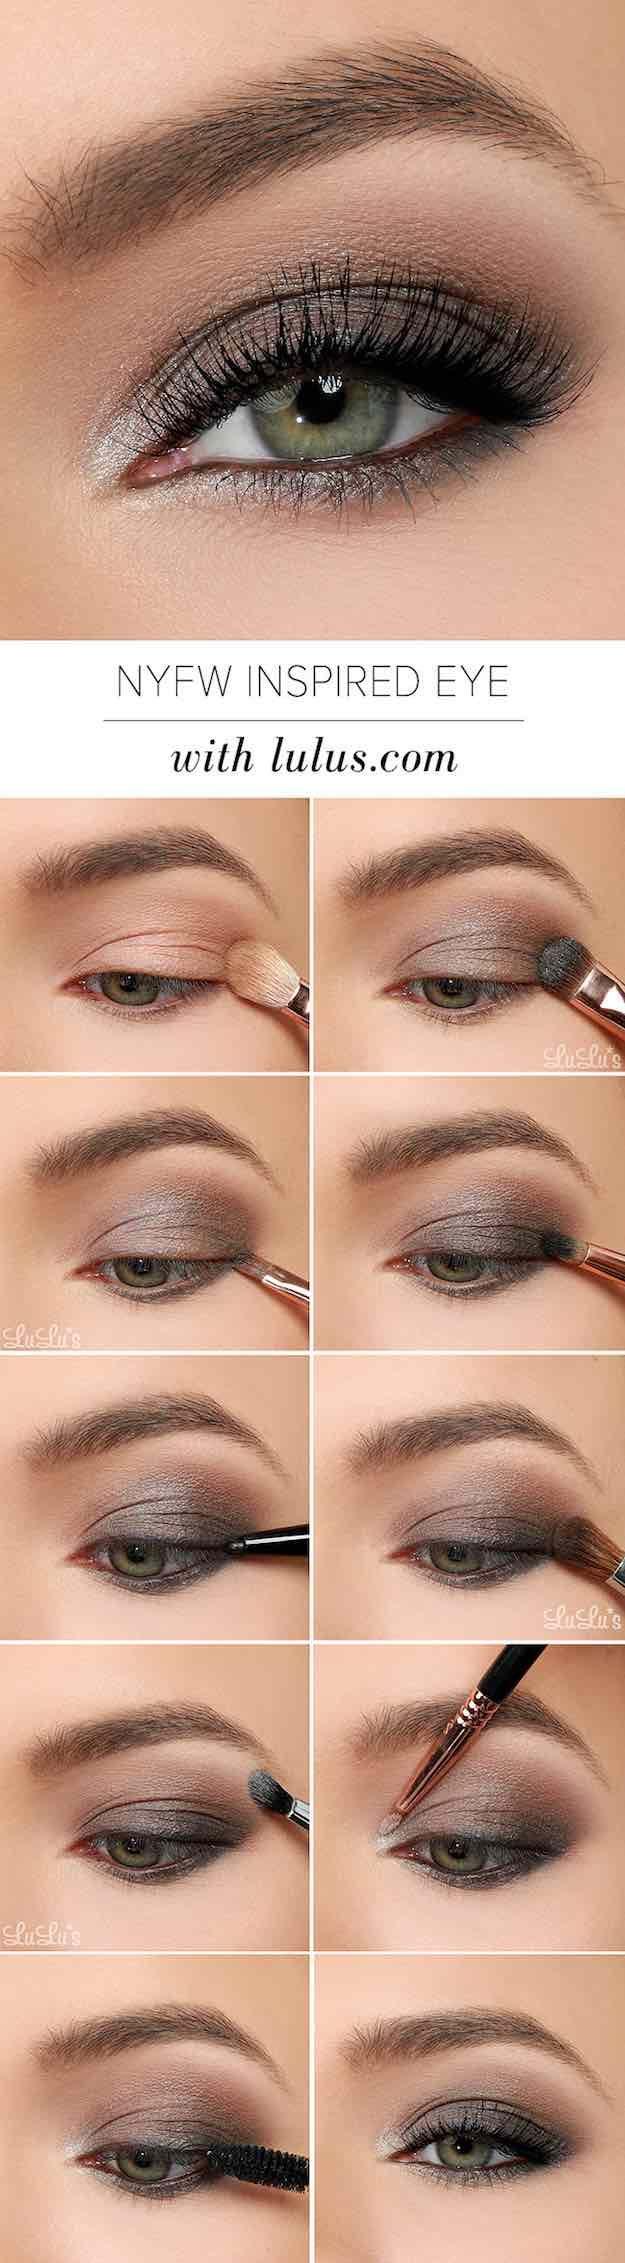 50 perfect makeup tutorials for green eyes   makeup   eye